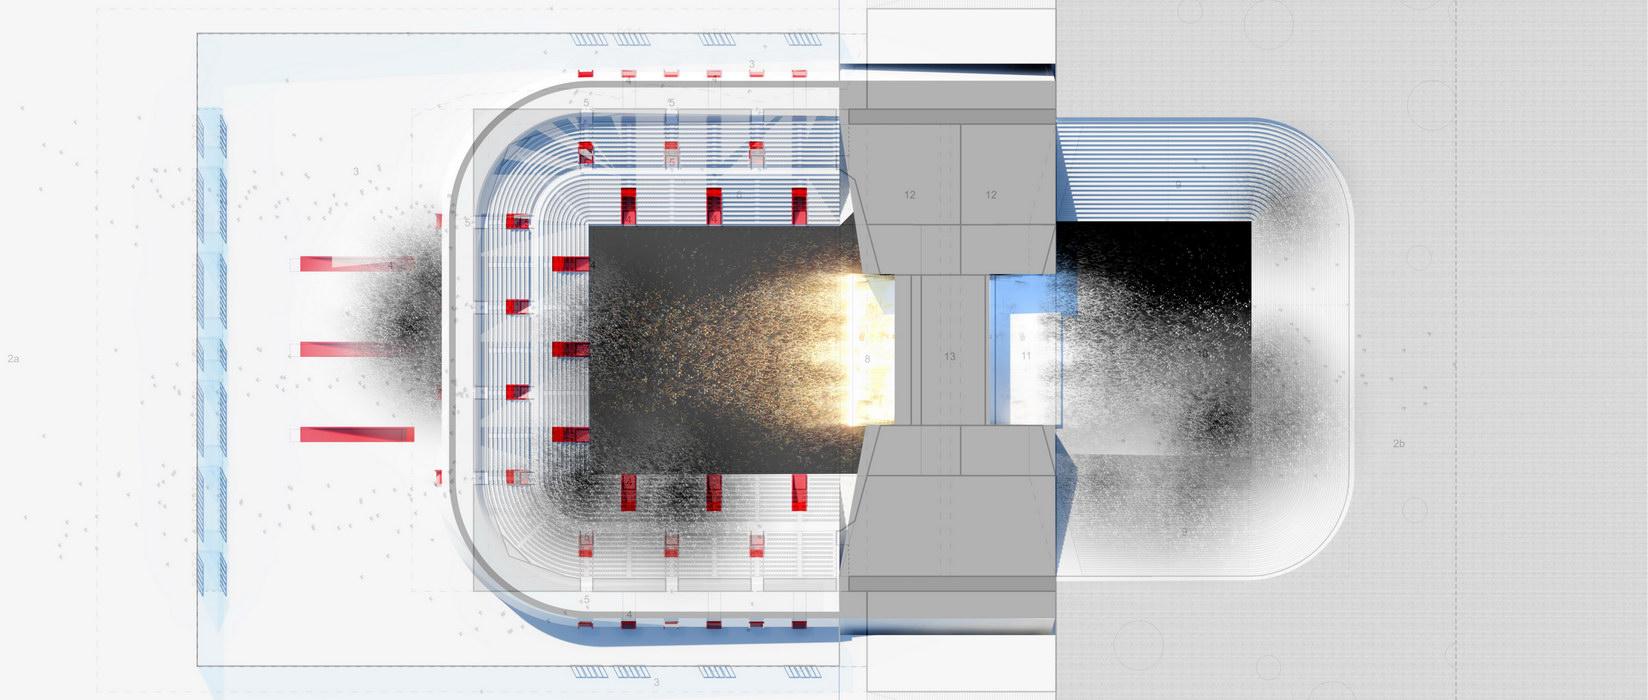 intro-crisan architecture-007_resize